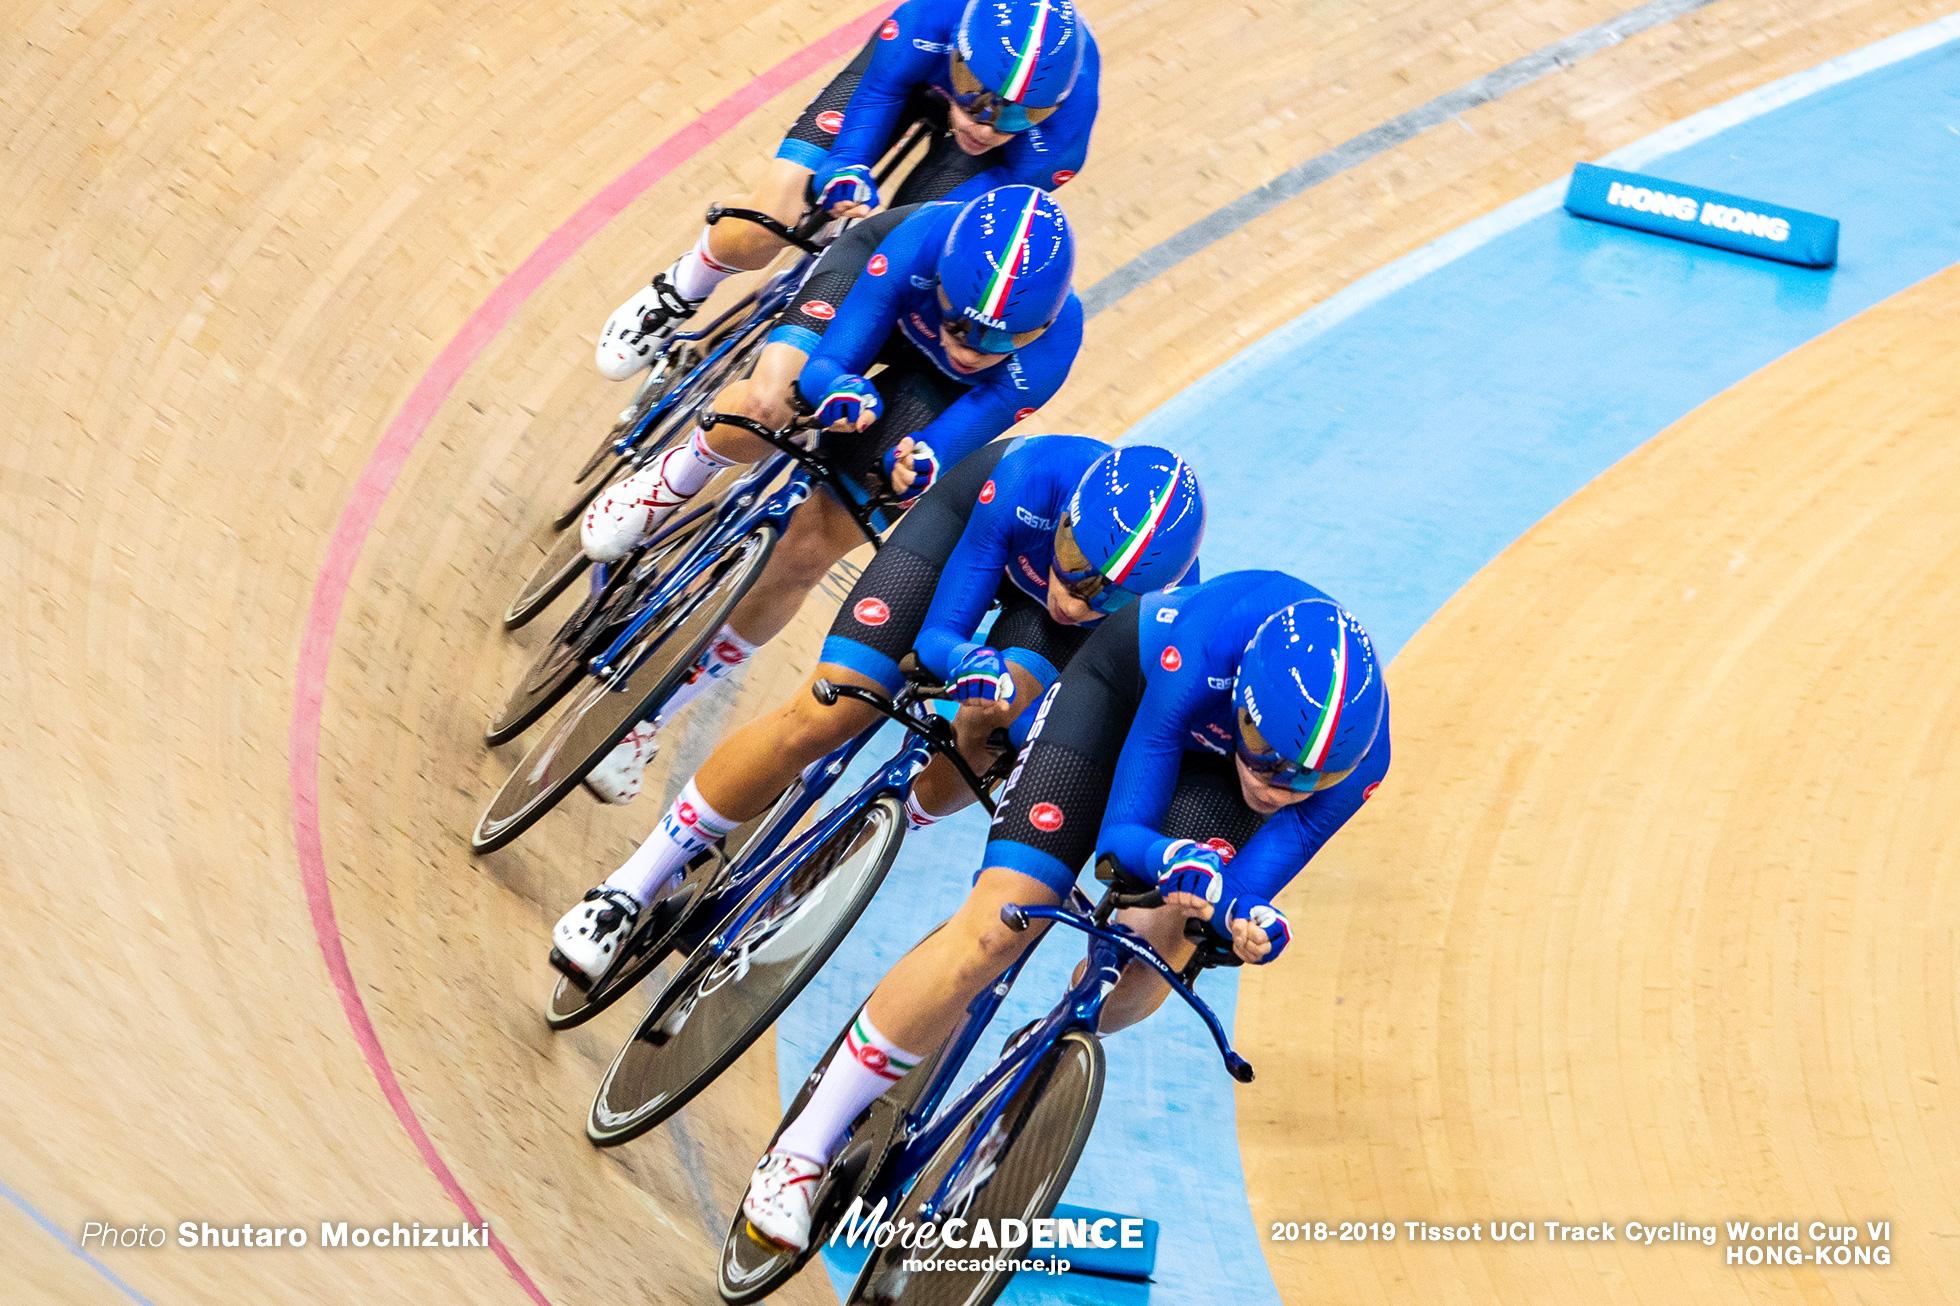 Final / Women's Team Pursuit / Track Cycling World Cup VI / Hong-Kong